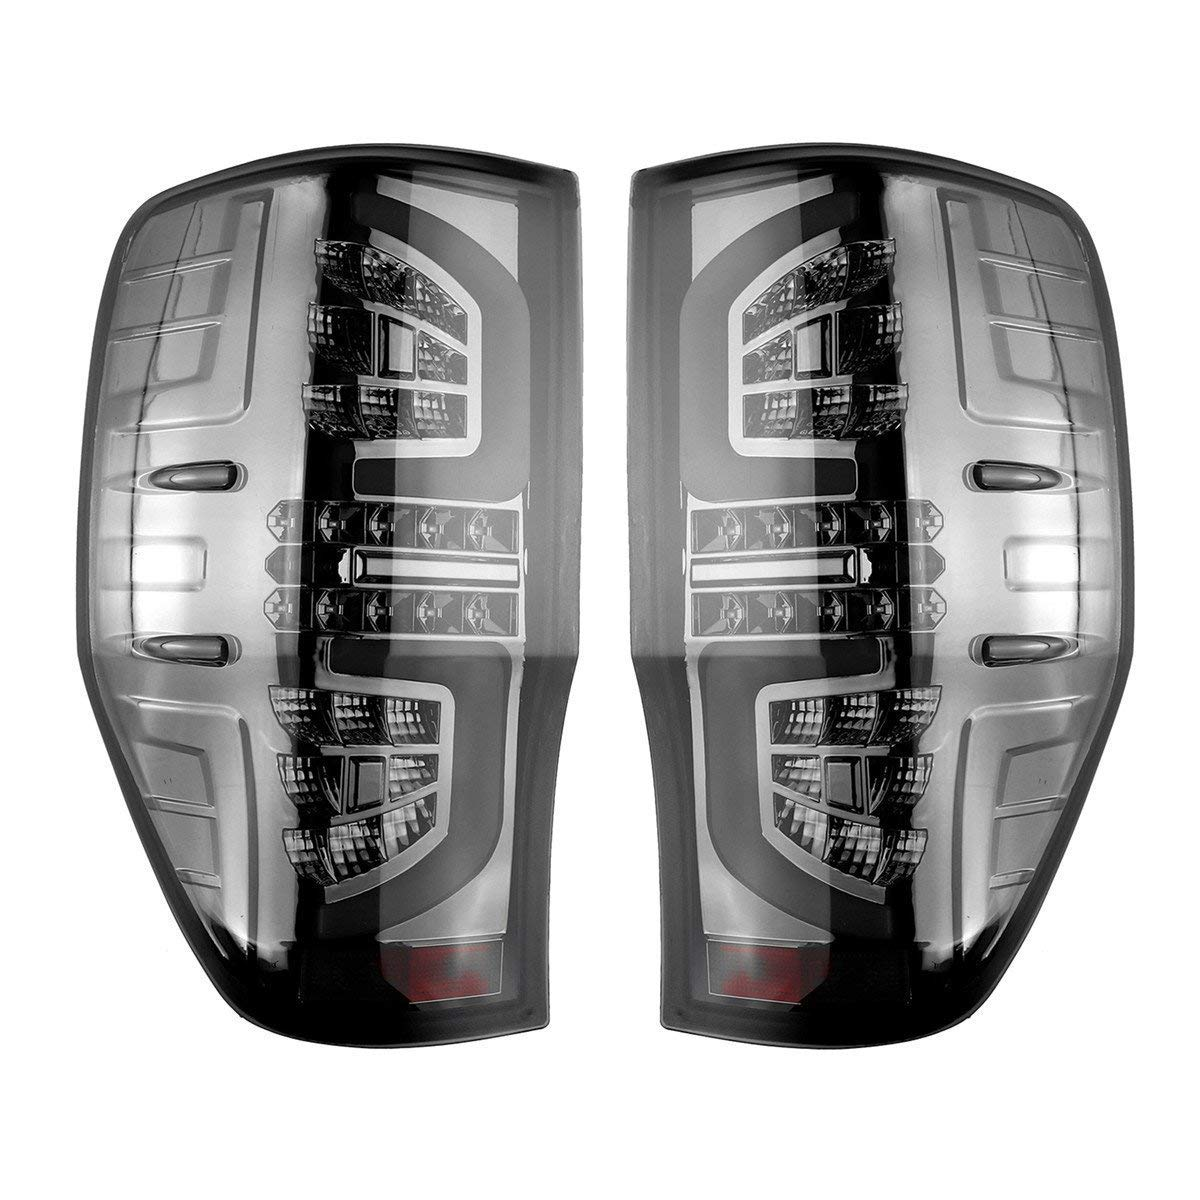 Casavidas Pair Smoked LED Car Rear Tail Light Lamps for Ford Ranger PX T6 MK2 XL XLT XLS Wildtrak at Generic